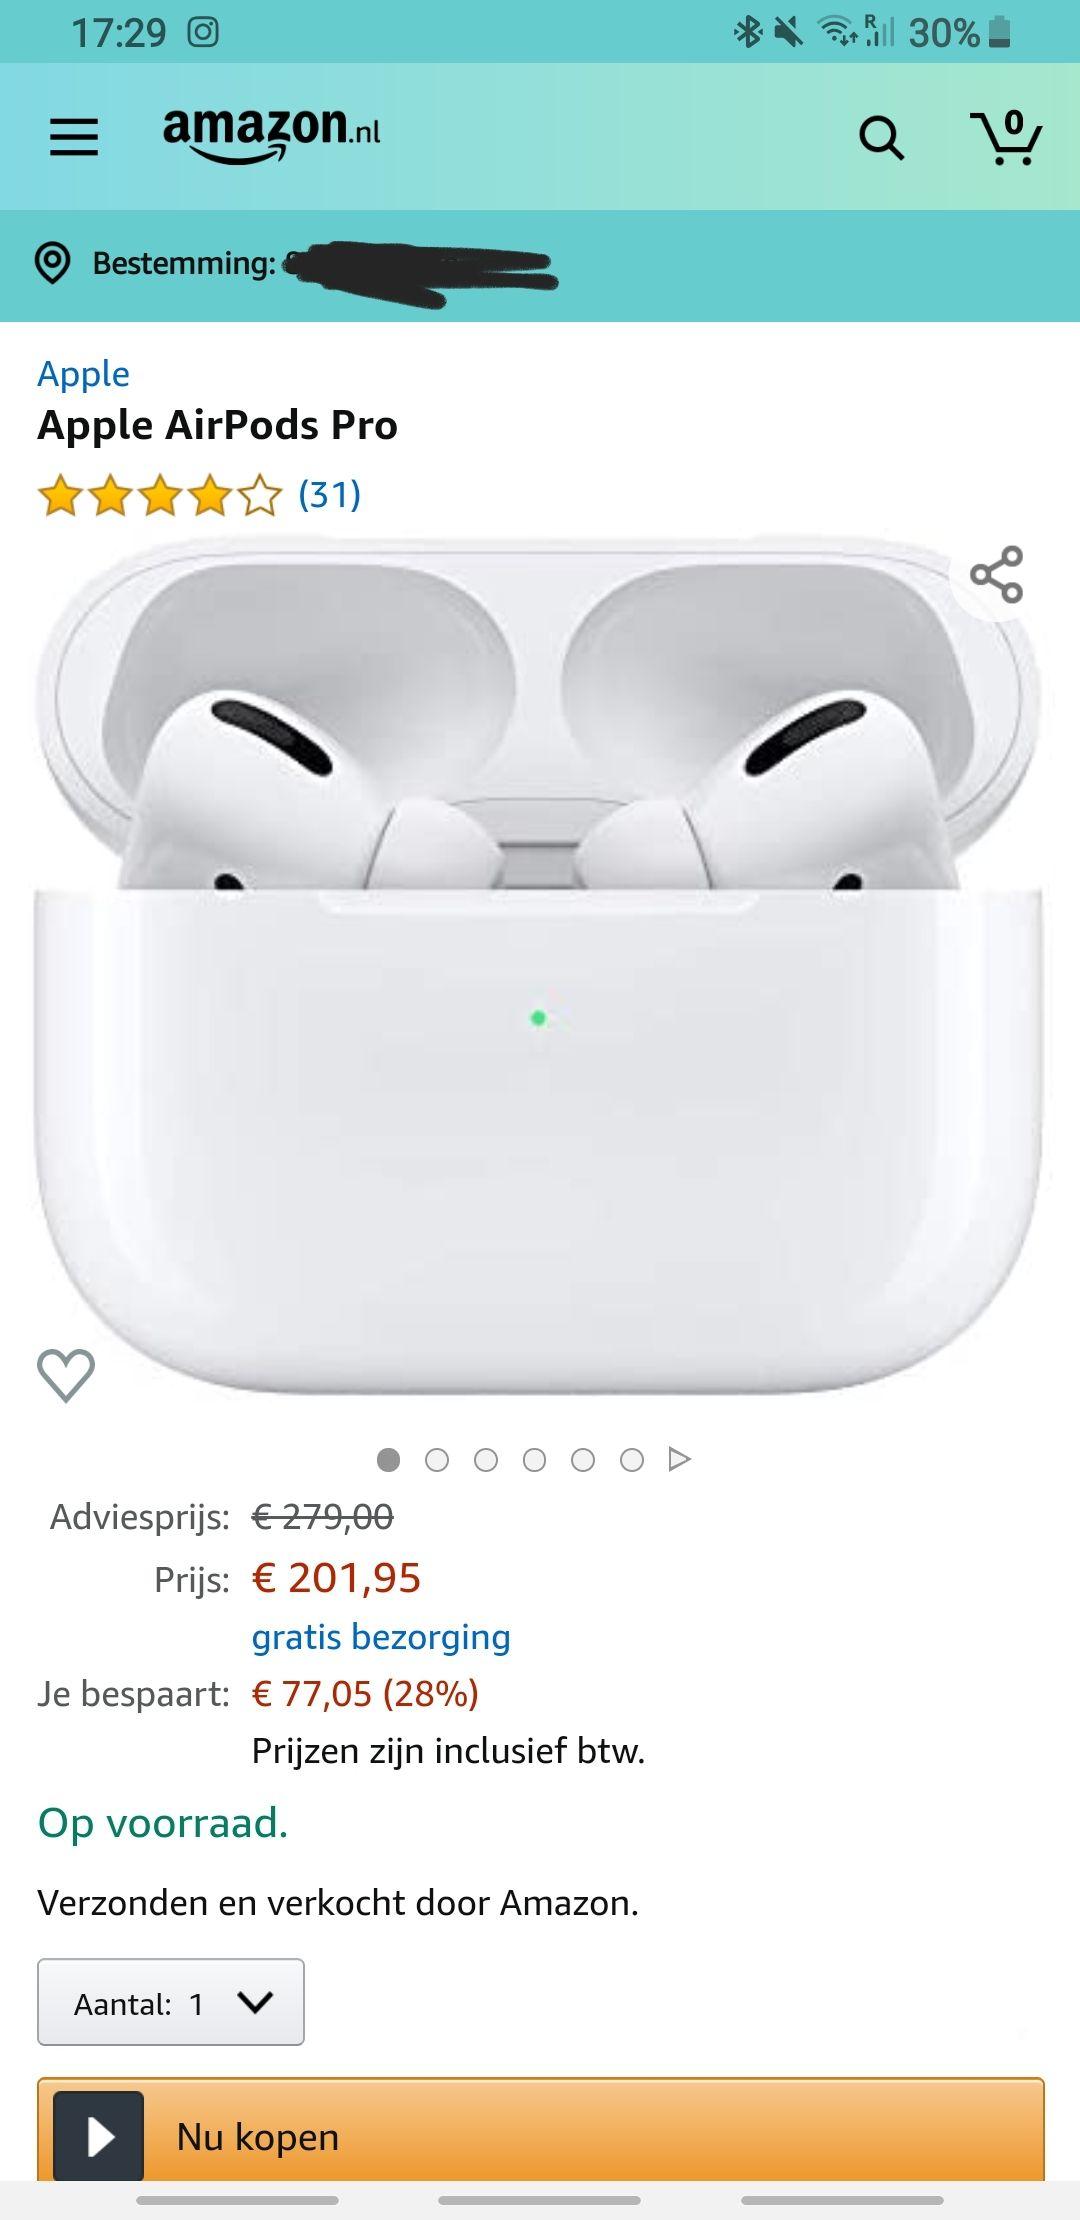 Apple airpods pro met korting @Amazon